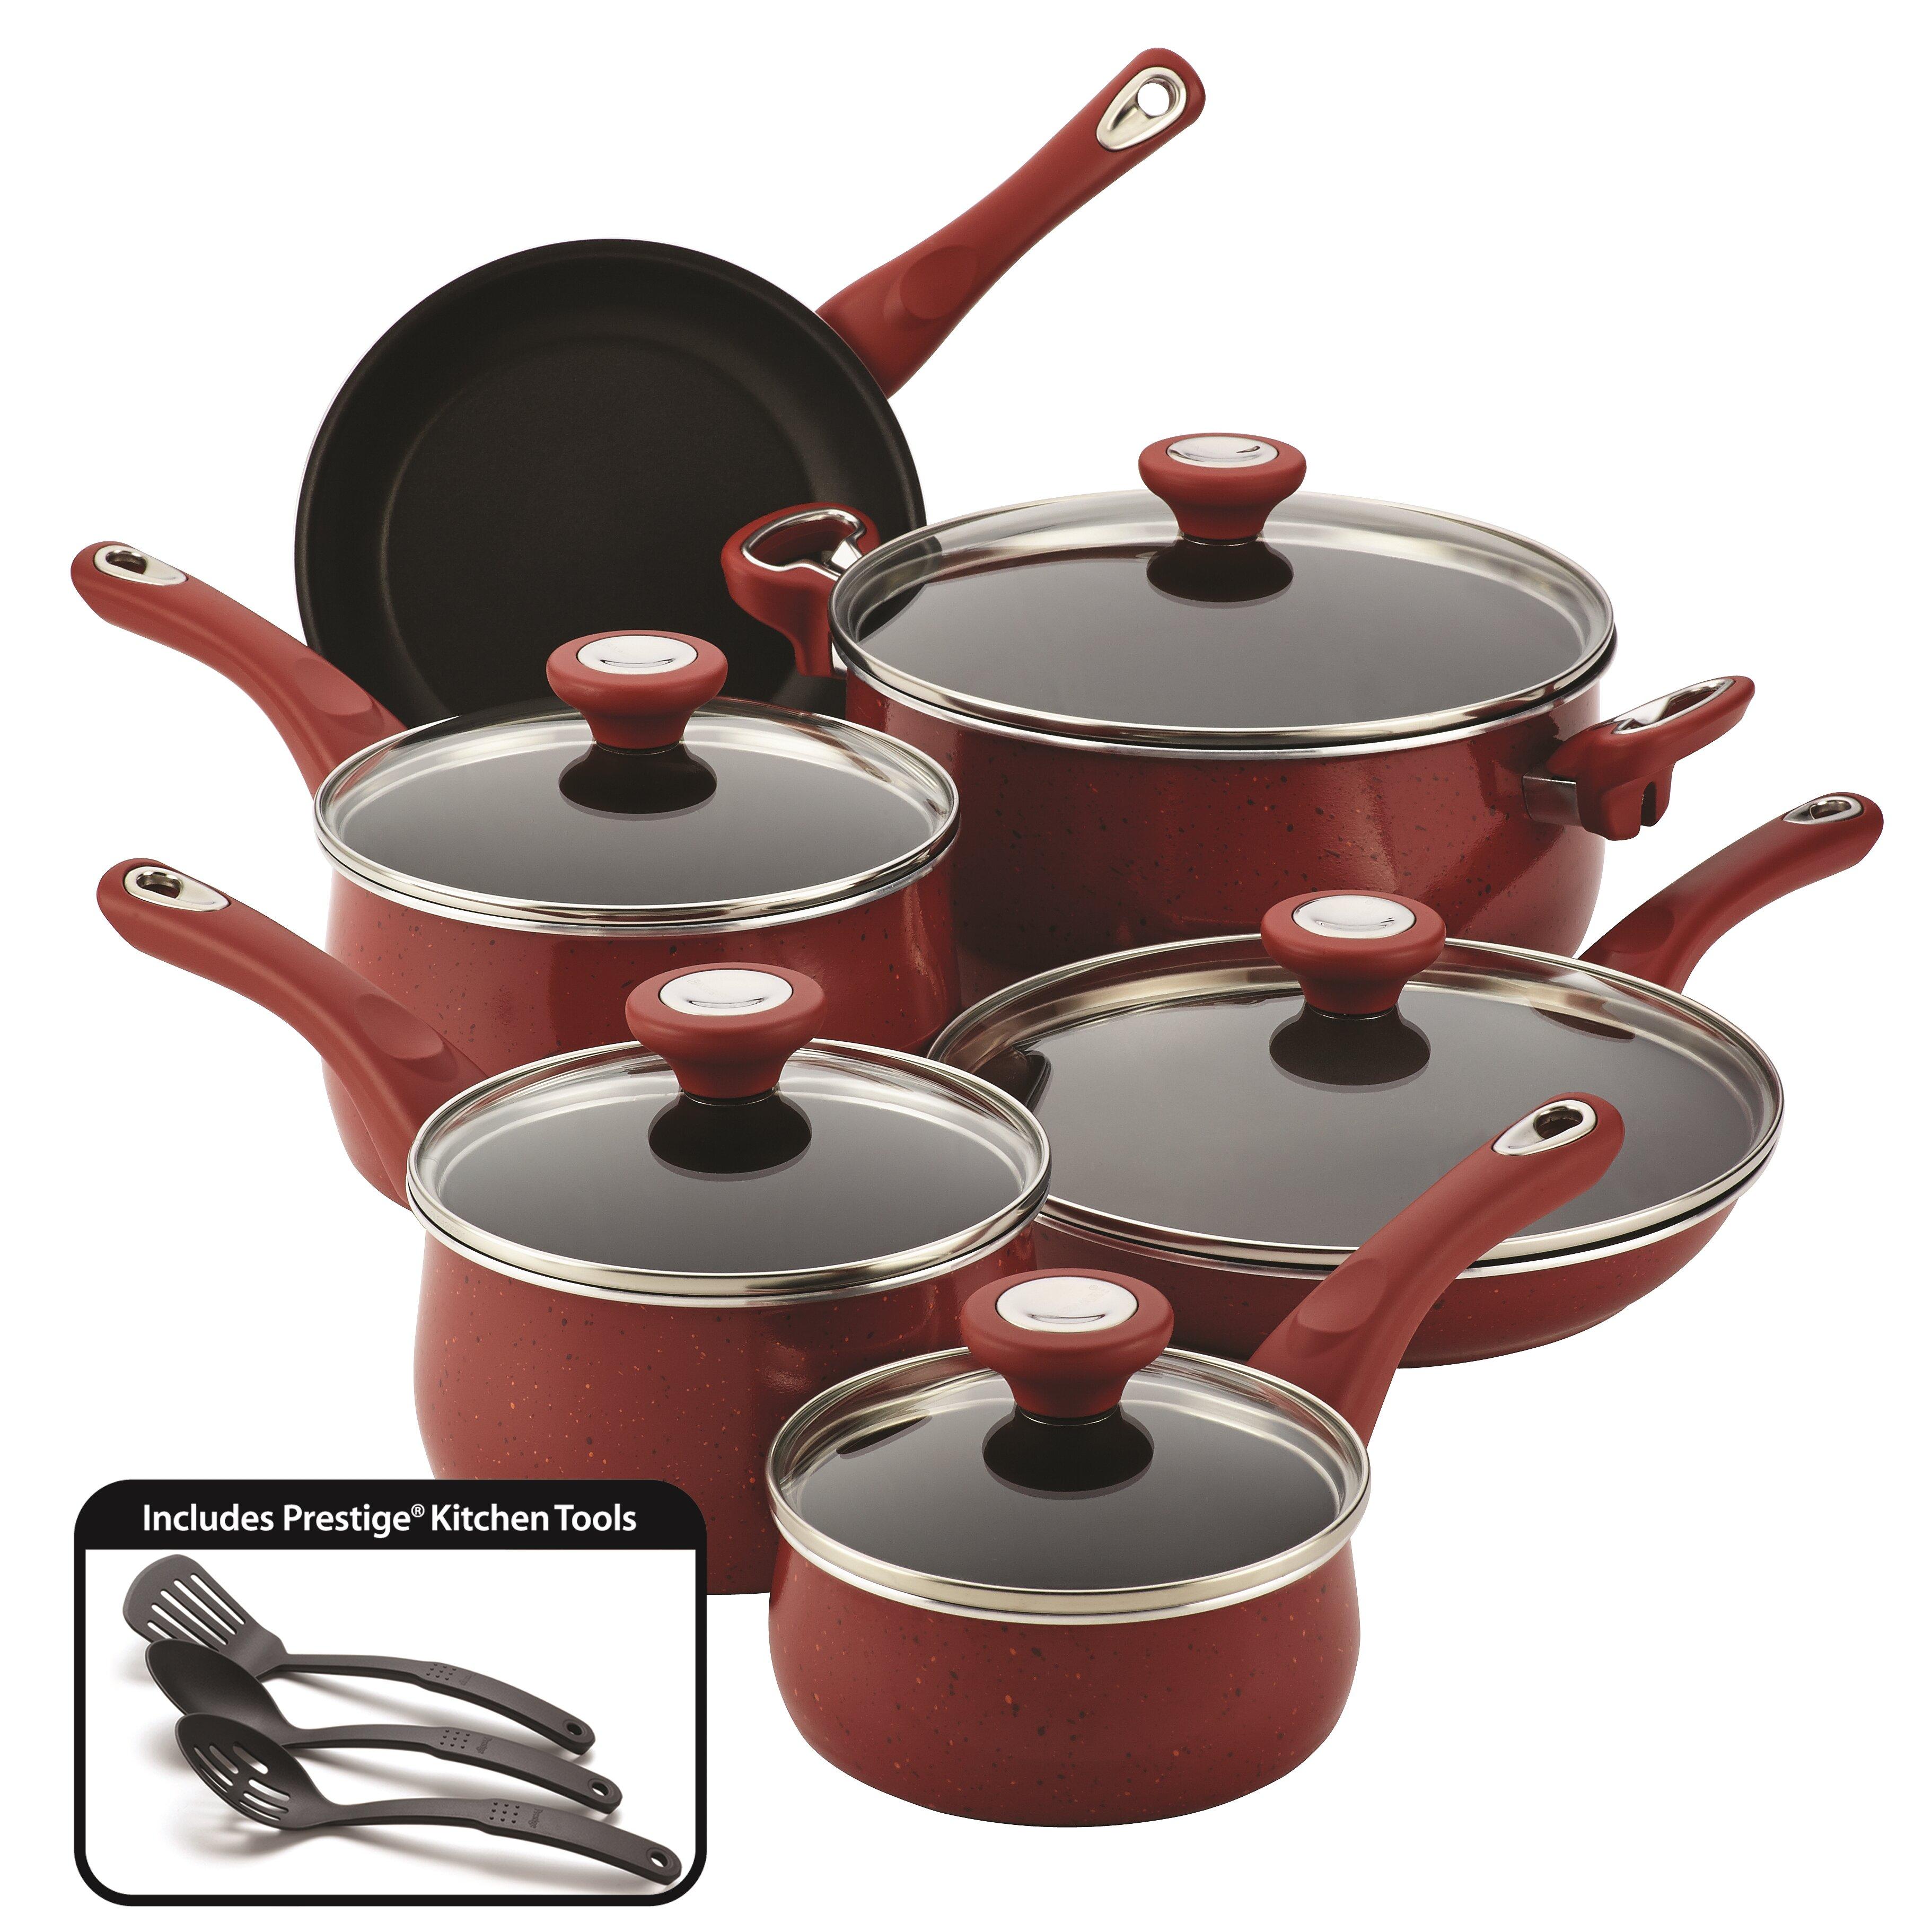 Farberware New Traditions 14 Piece Cookware Set & Reviews | Wayfair